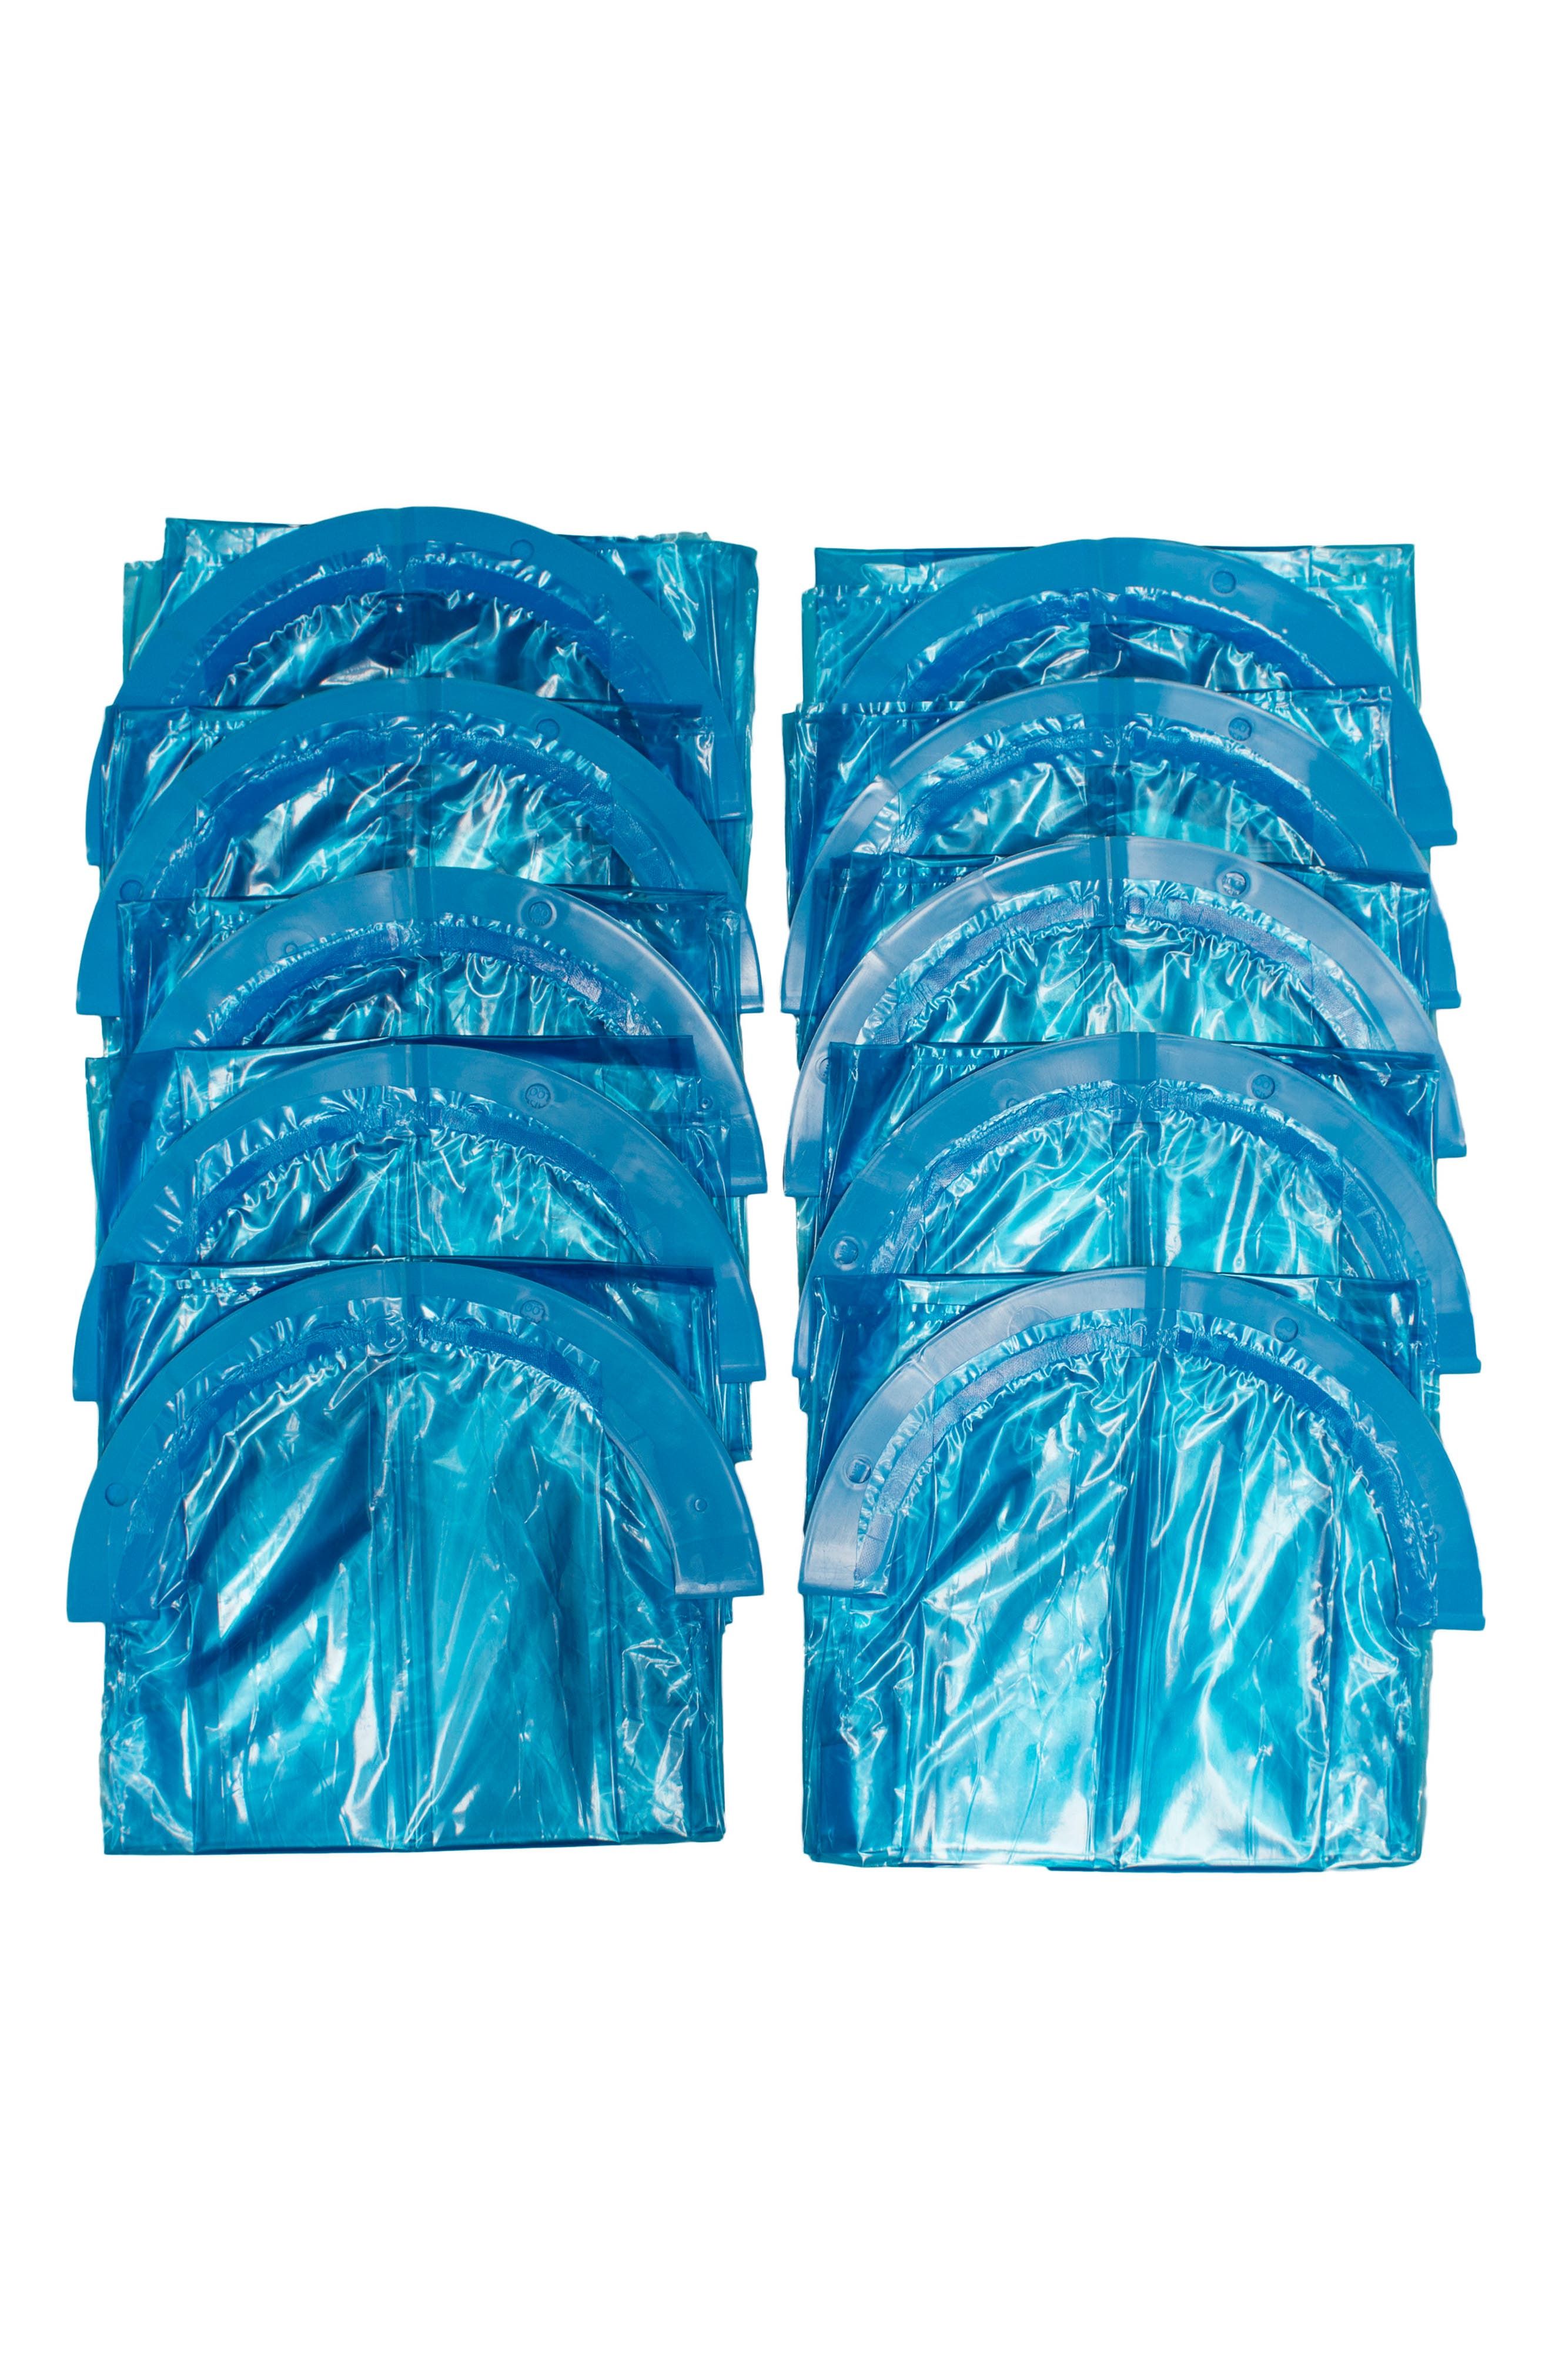 Twist'r Diaper Disposal System Set of 10 Refill Bags,                             Main thumbnail 1, color,                             100